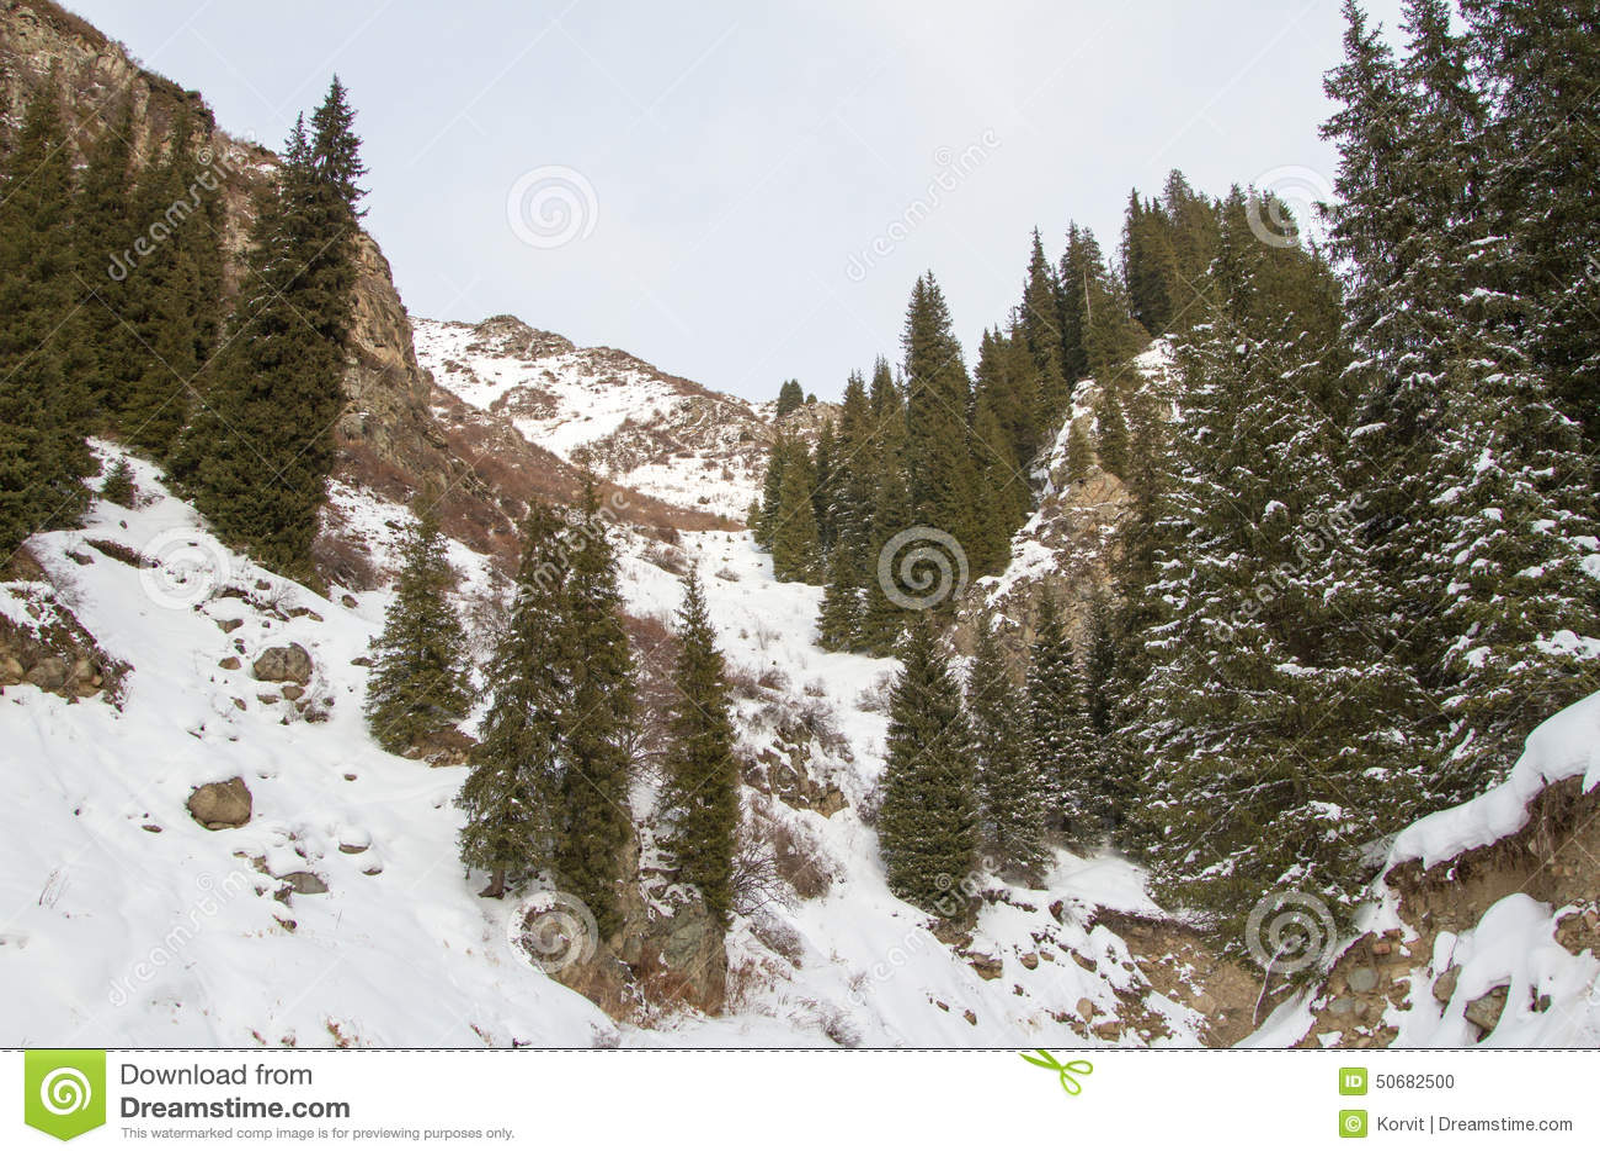 Download 天山冷杉 库存照片. 图片 包括有 横向, 云彩, 下雪, 场面, 阳光, 神仙, 冷杉, 具球果, 范围 - 50682500